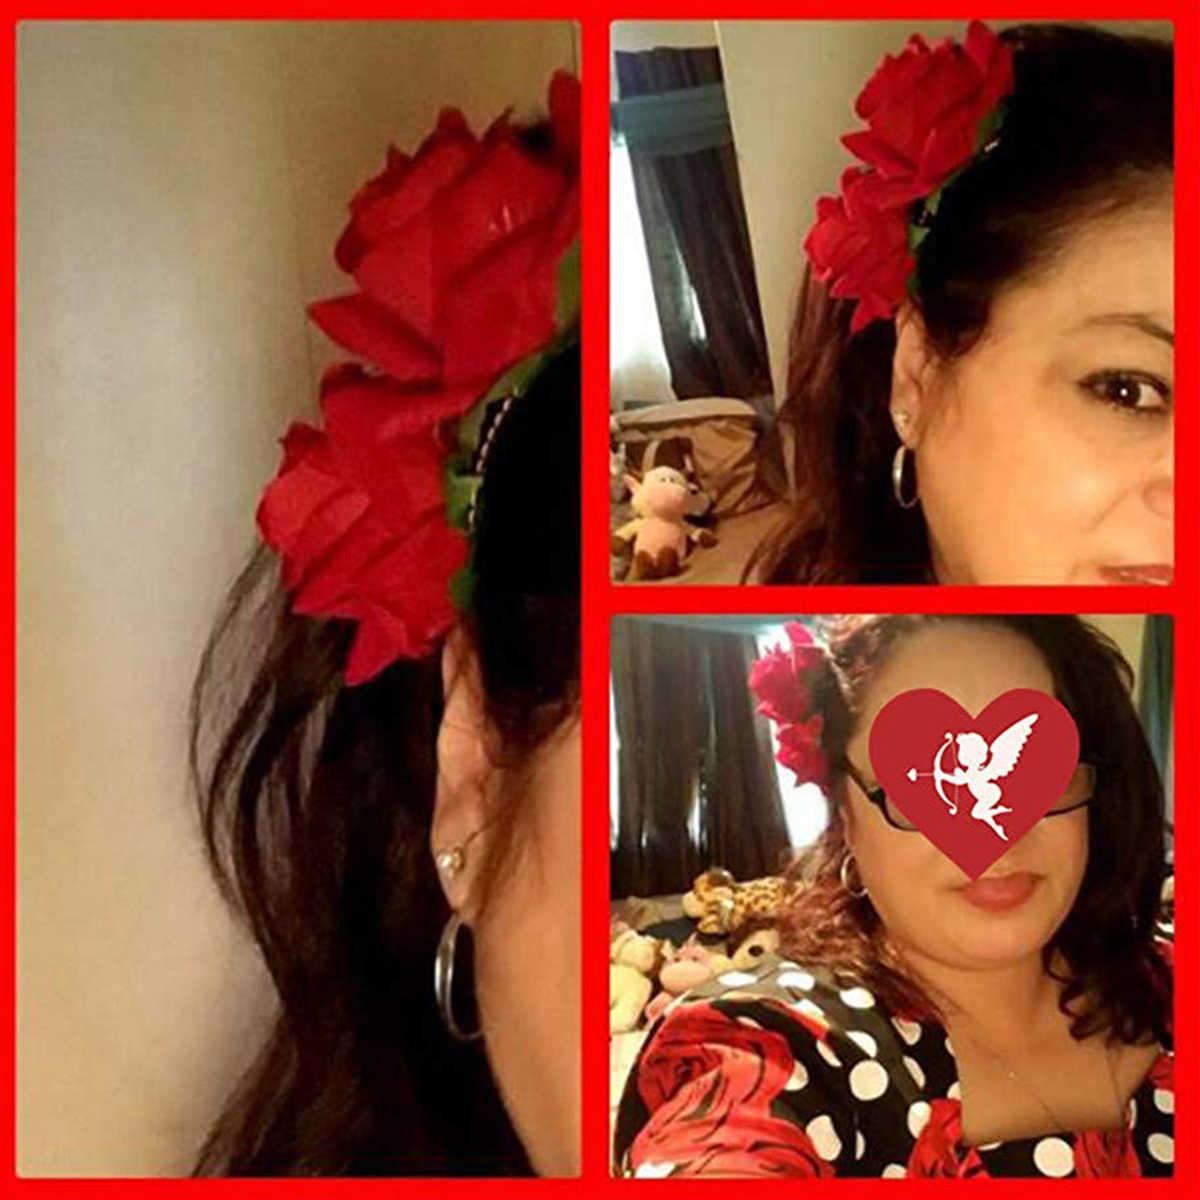 Rose Bunga Rambut Klip Slide Flame Spray Pin Bros Bunga Wanita Styling Rambut Klip Rambut Aksesoris